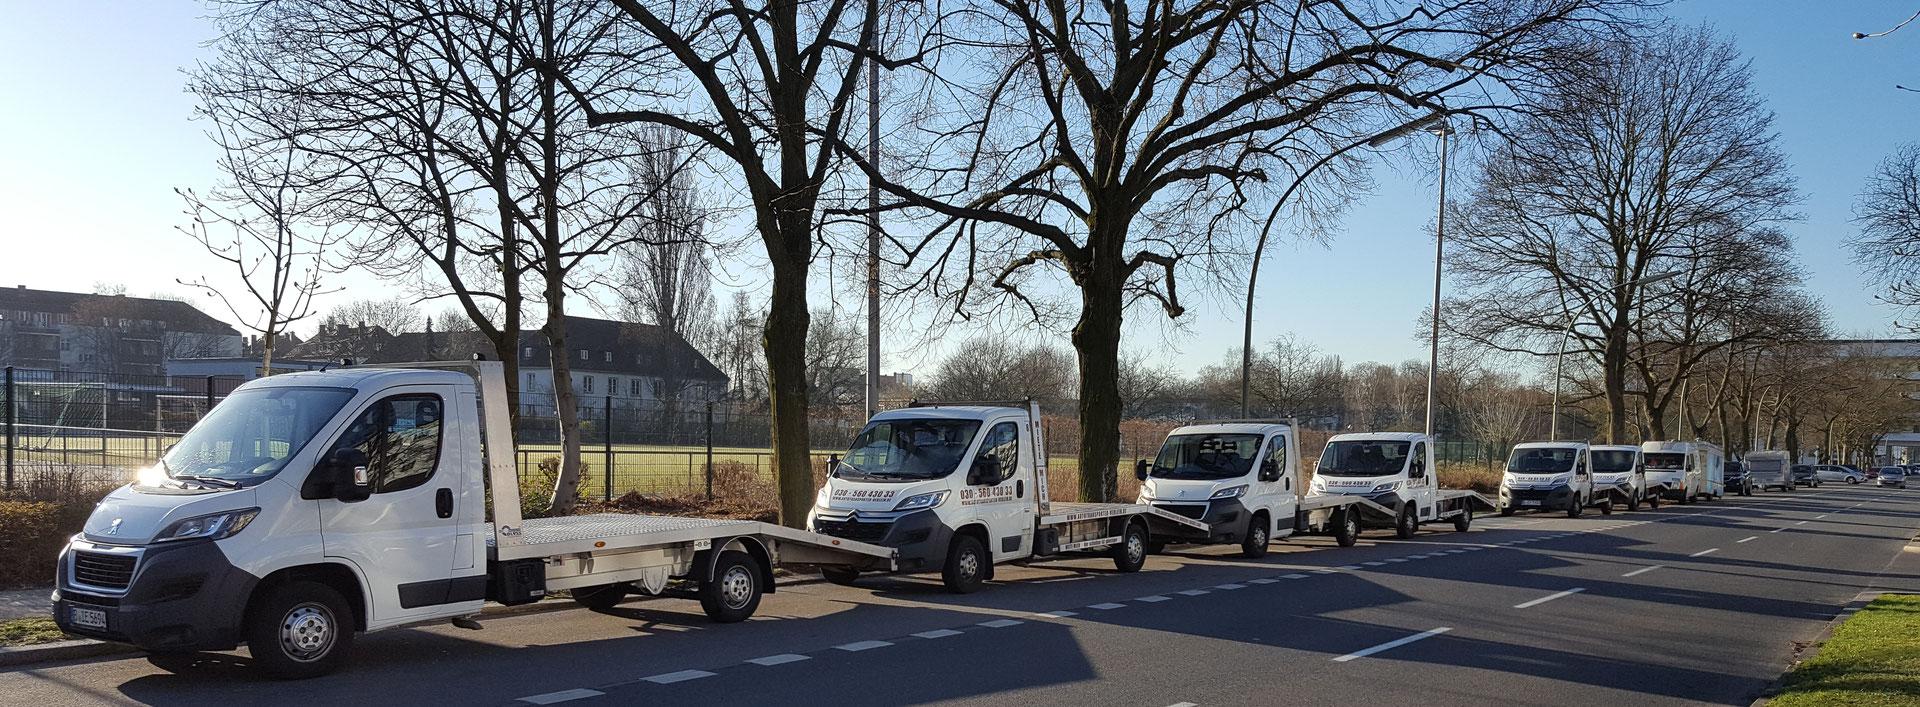 ab 59 90 abschleppwagen mieten hucke truck autotransporter vermietung. Black Bedroom Furniture Sets. Home Design Ideas